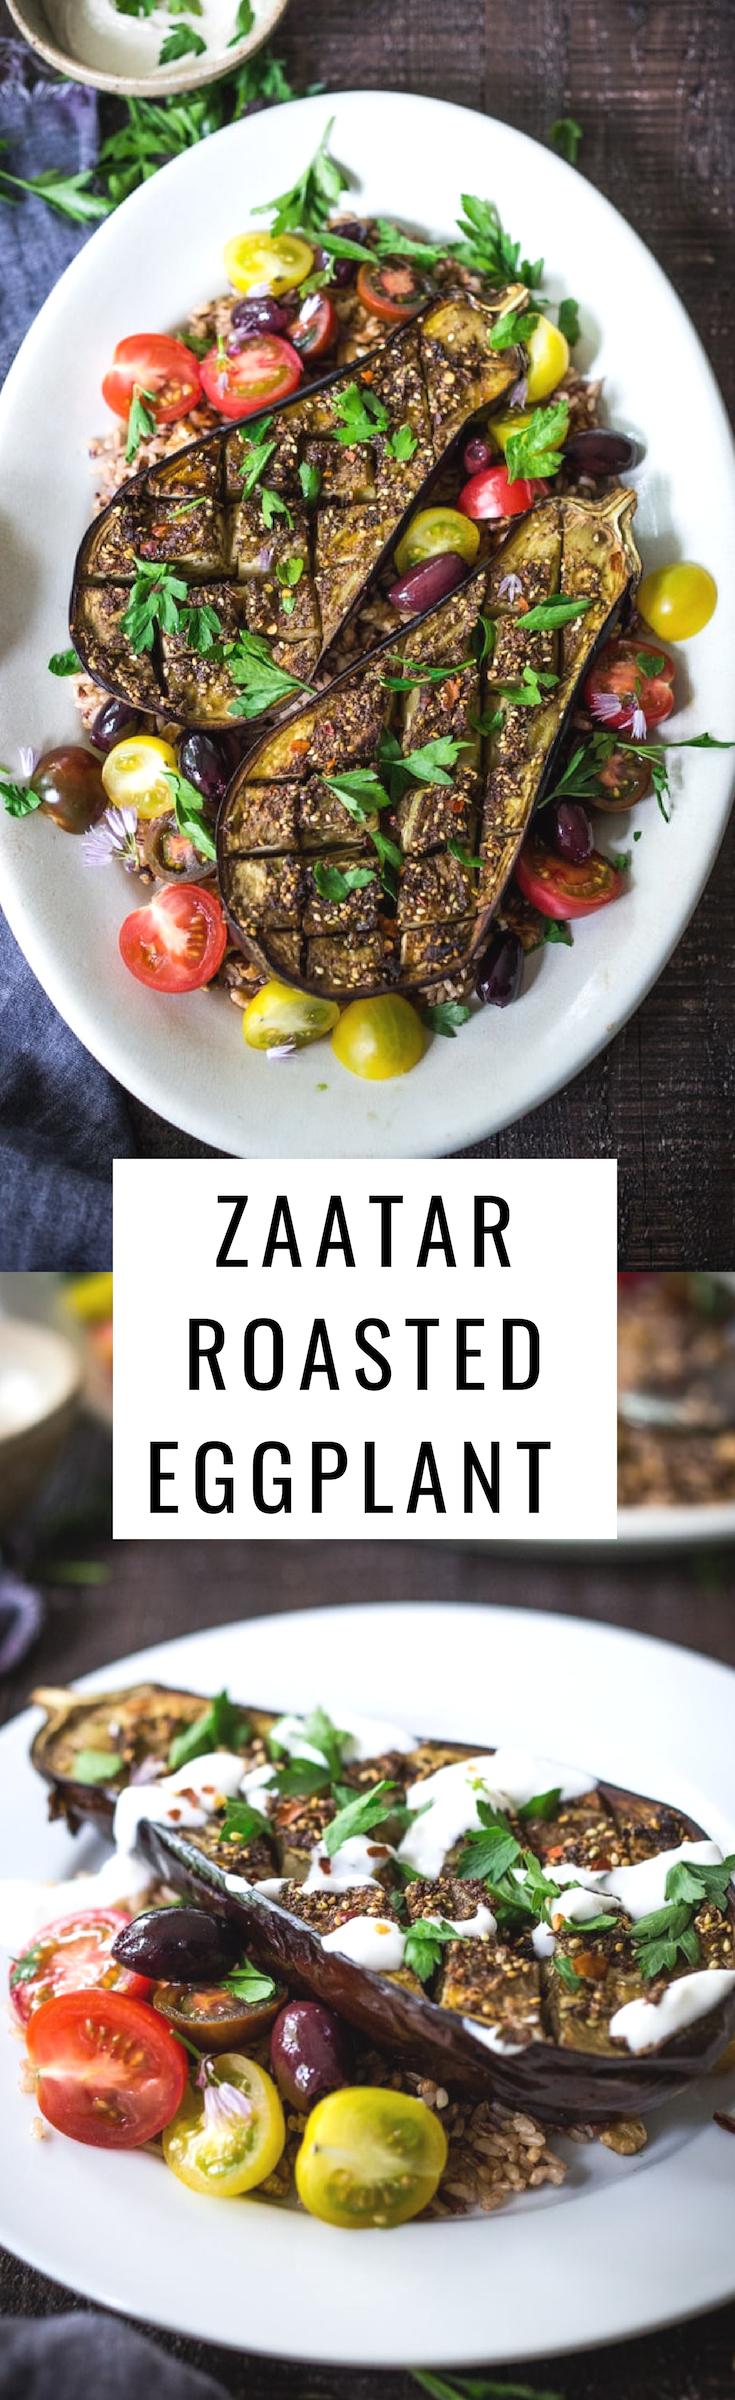 Zataar Roasted Eggplant served over rice or grains with lemony tahini sauce, plain yogurt or tzatzki sauce. Vegan, Gluten-free! | www.feastingathome.com #vegan #eggplant #roastedeggplant #veganeggplant #zaatar #zaatareggplant